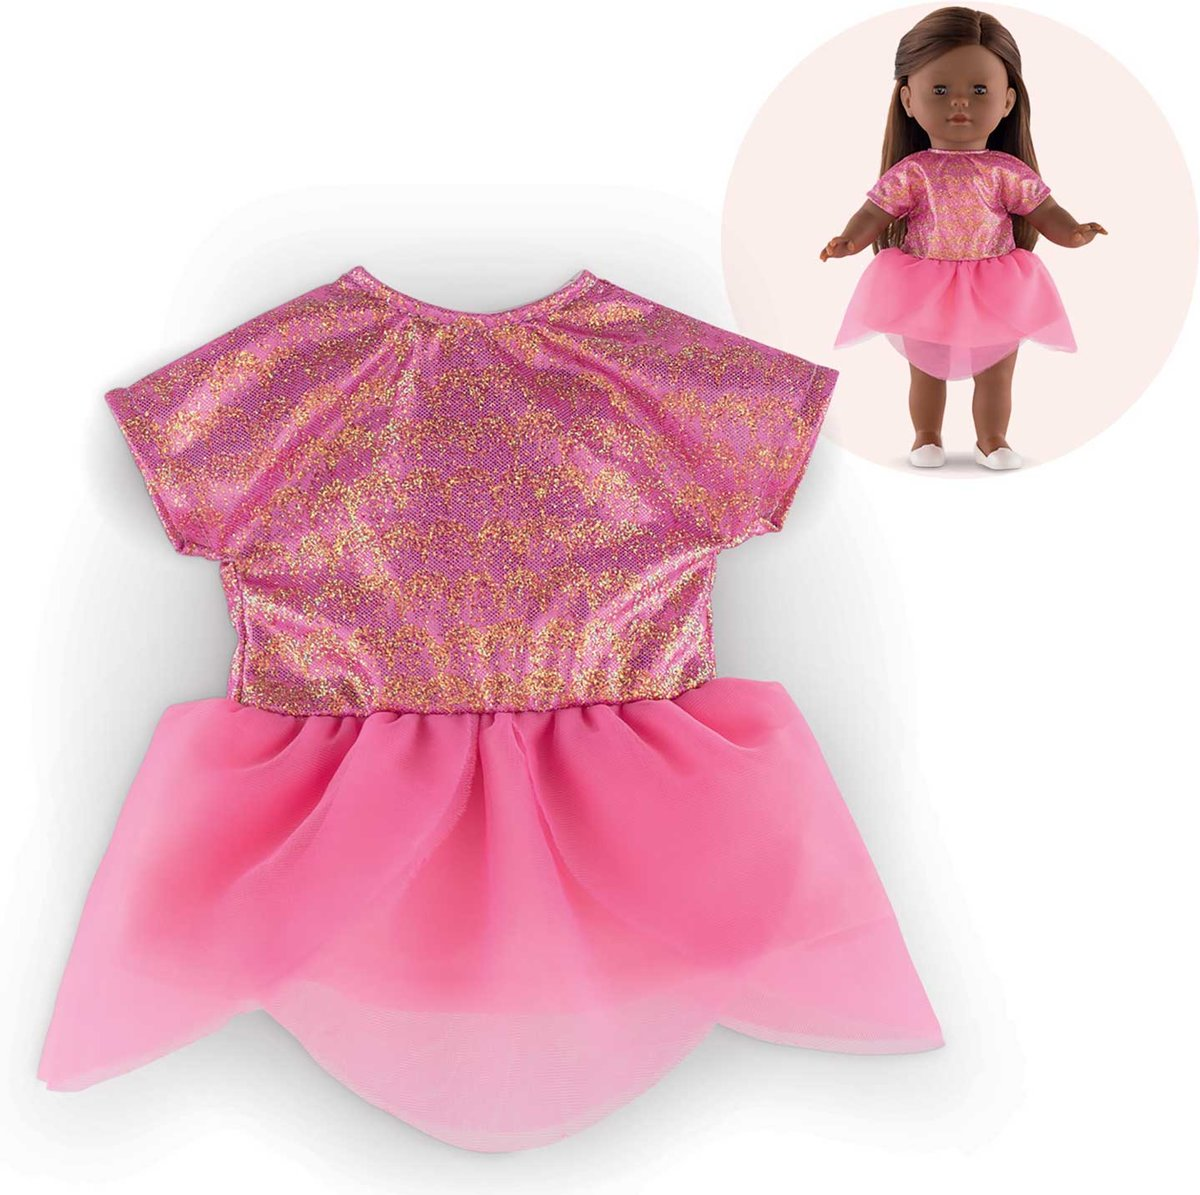 Corolle Ma Corolle kleding Fairy Dress 36 cm